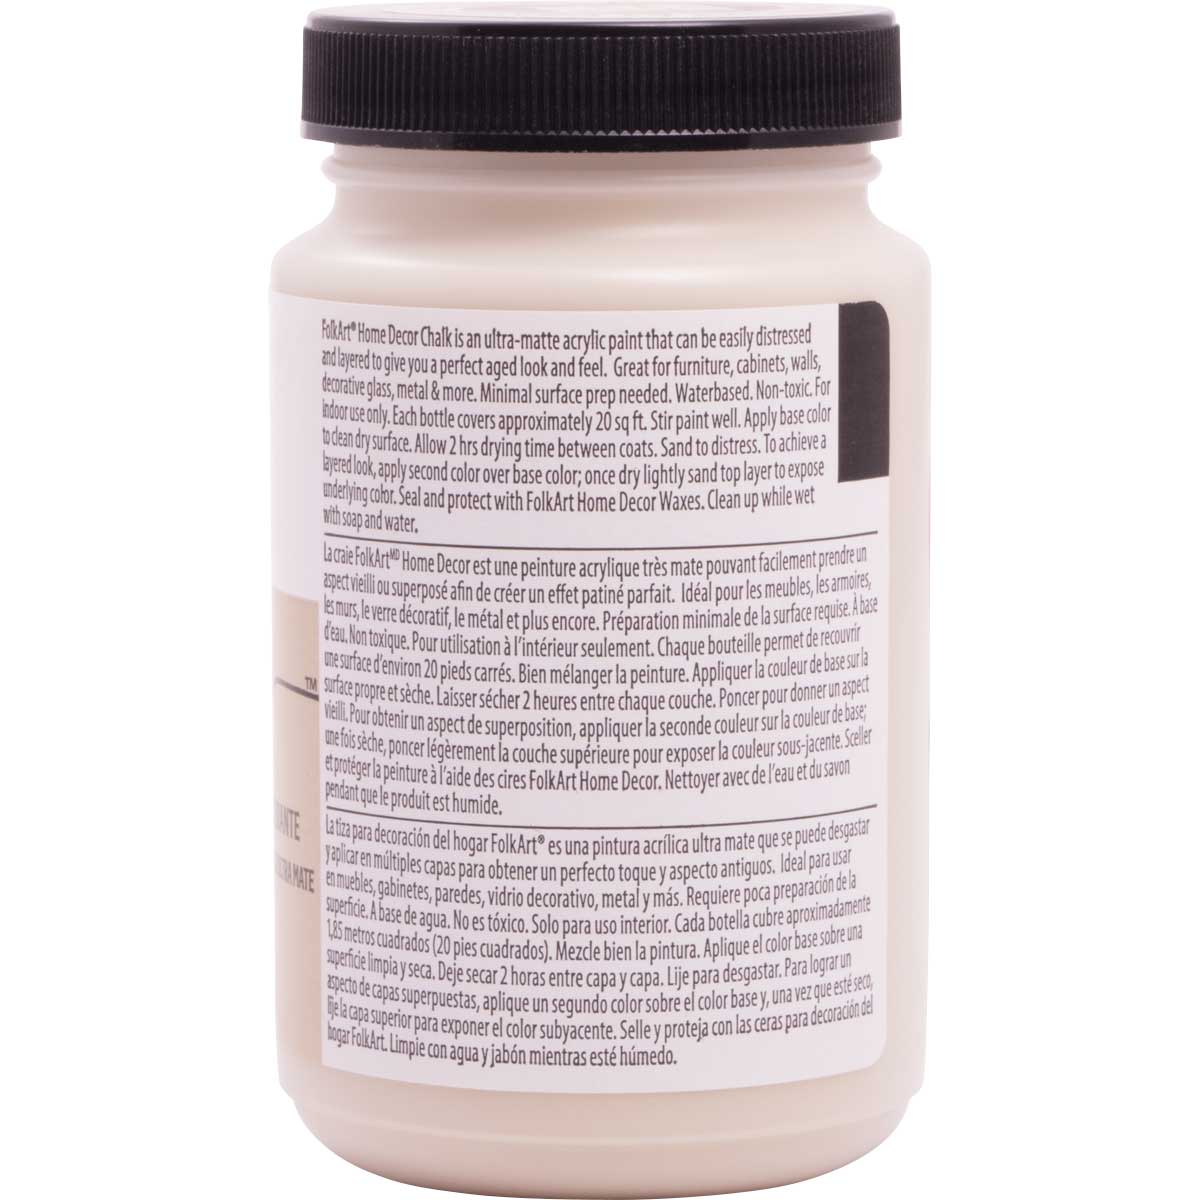 FolkArt ® Home Decor™  Chalk - Whispering Wheat, 8 oz.